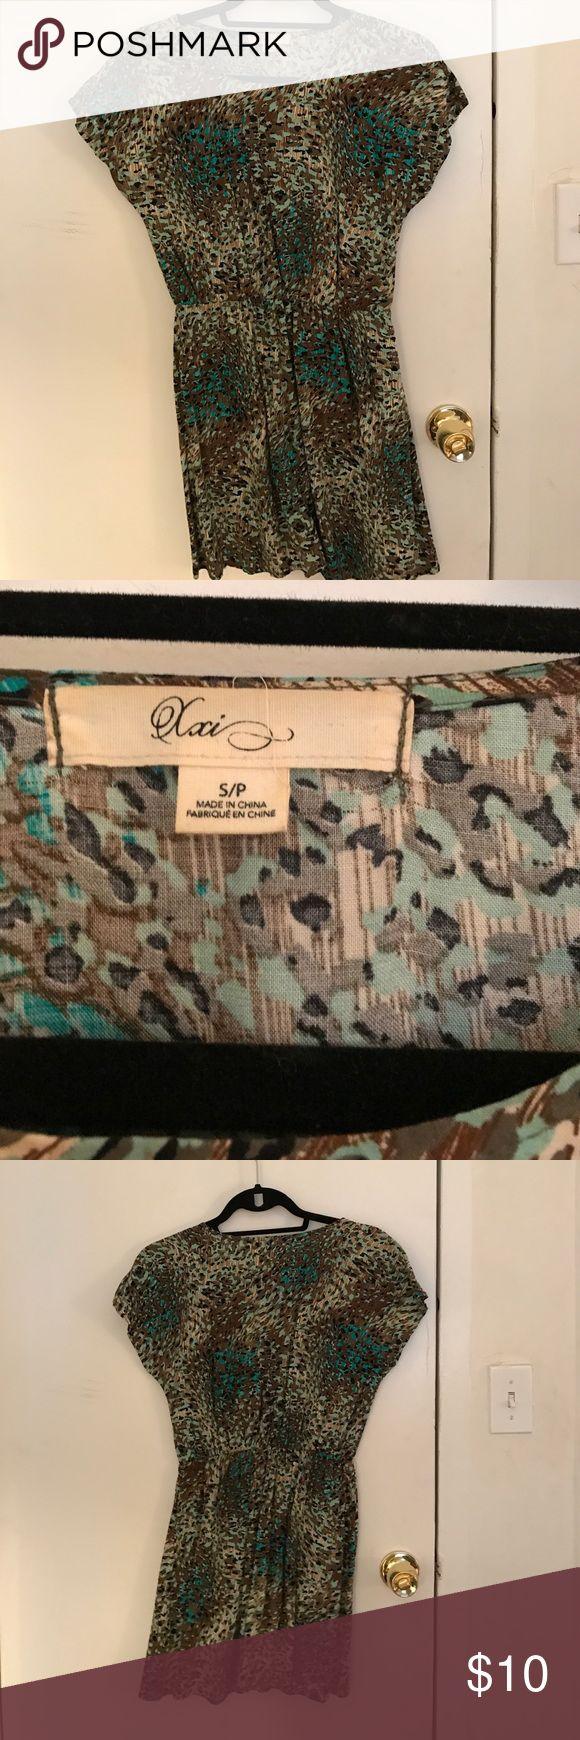 Animal print mini dress Short, easy, loose fitting dress Forever 21 Dresses Mini